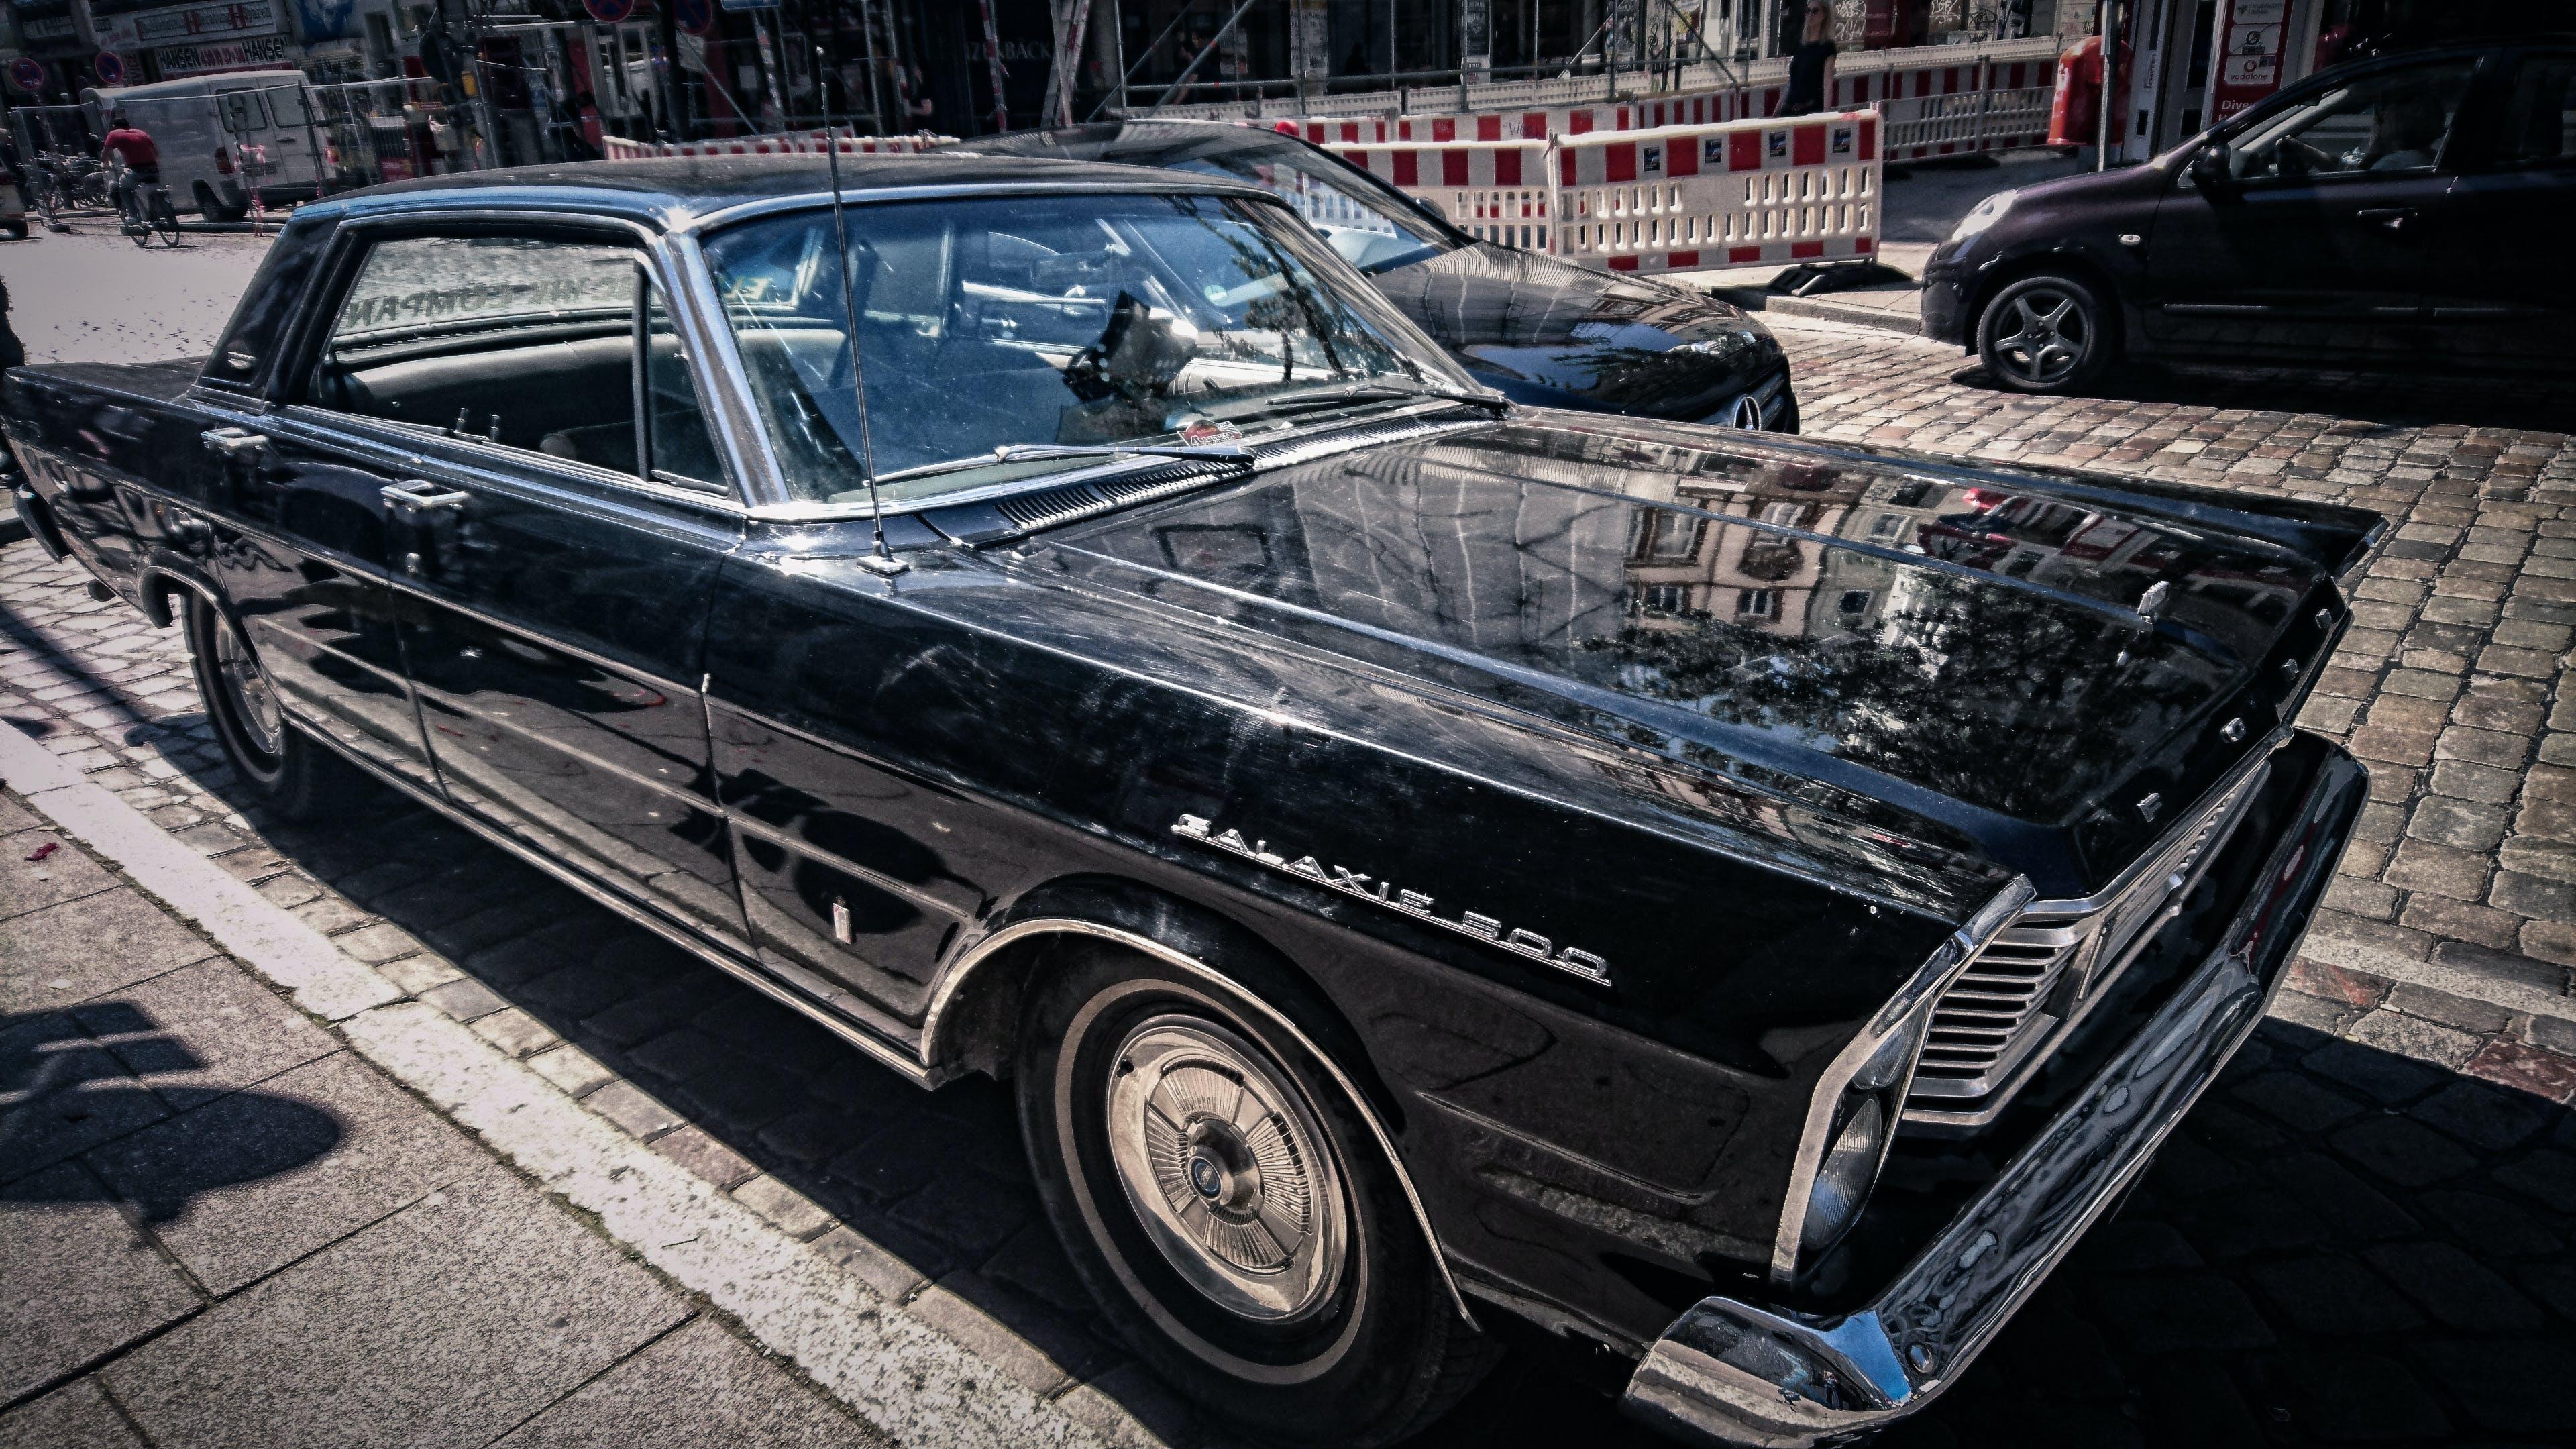 Black Sedan on Road Photography